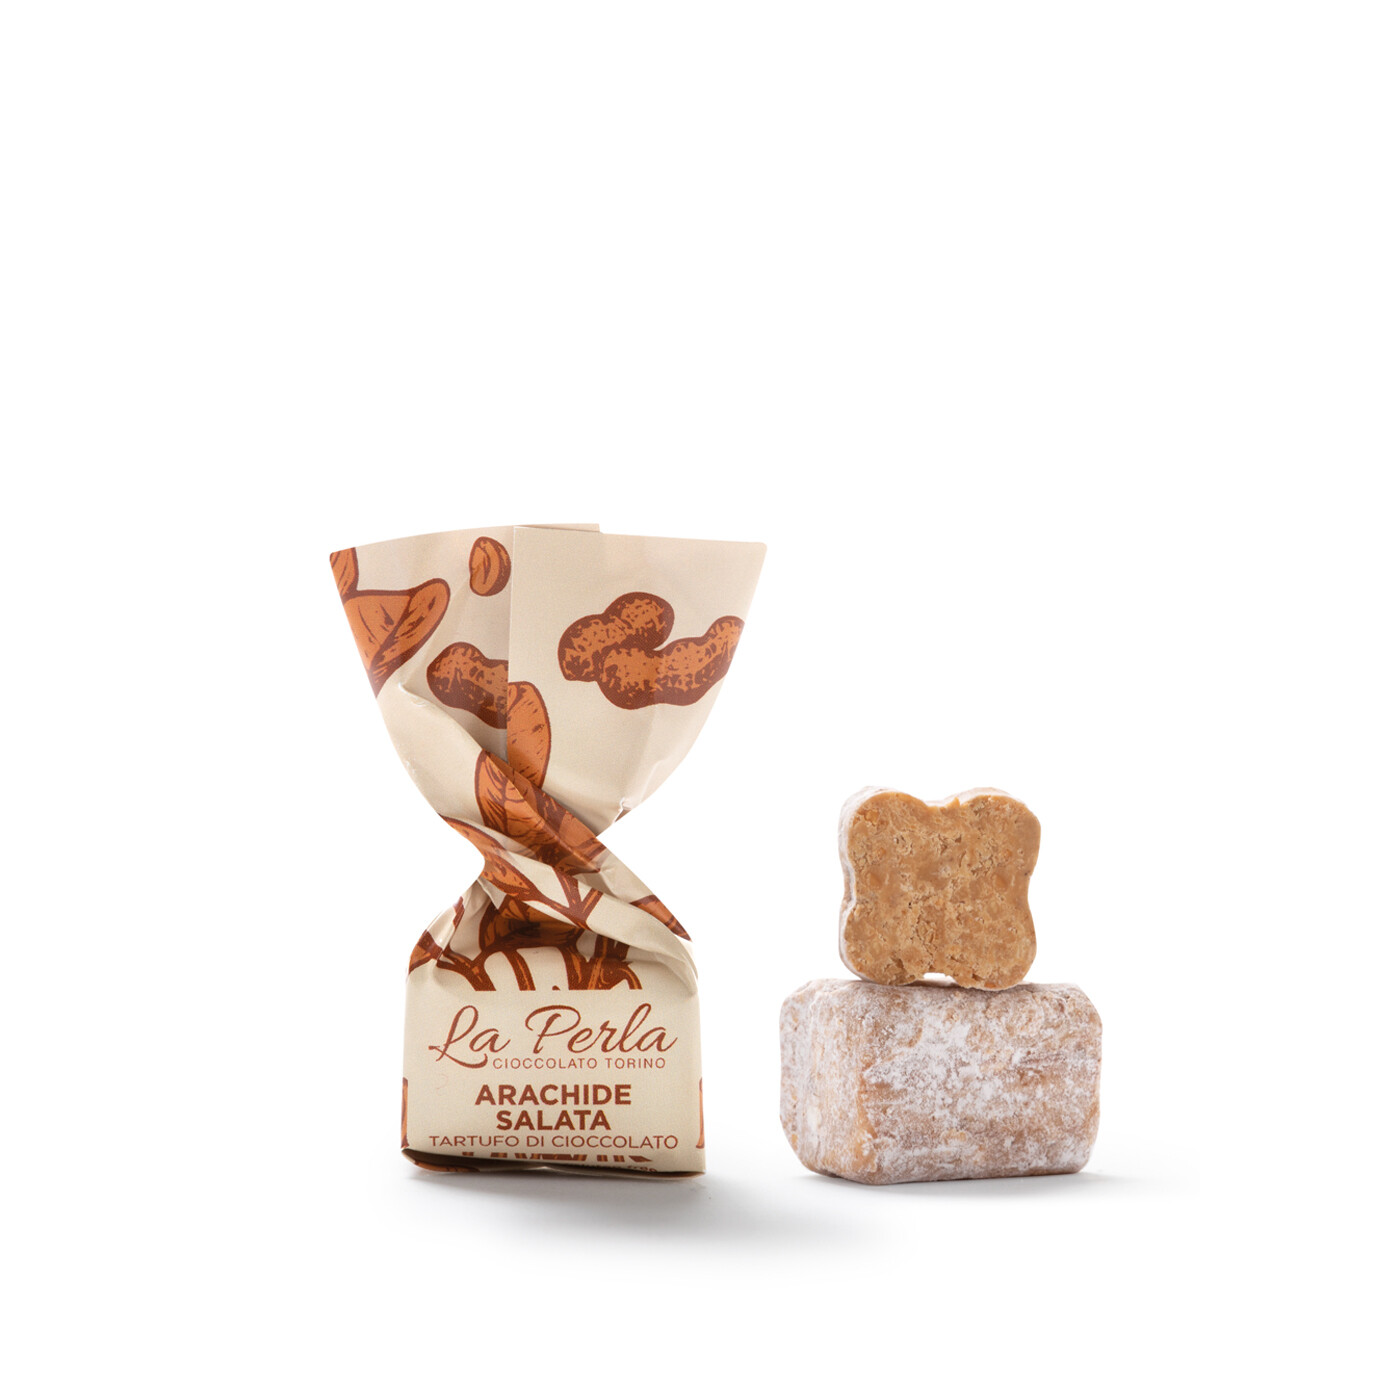 La Perla - Arachide Salata